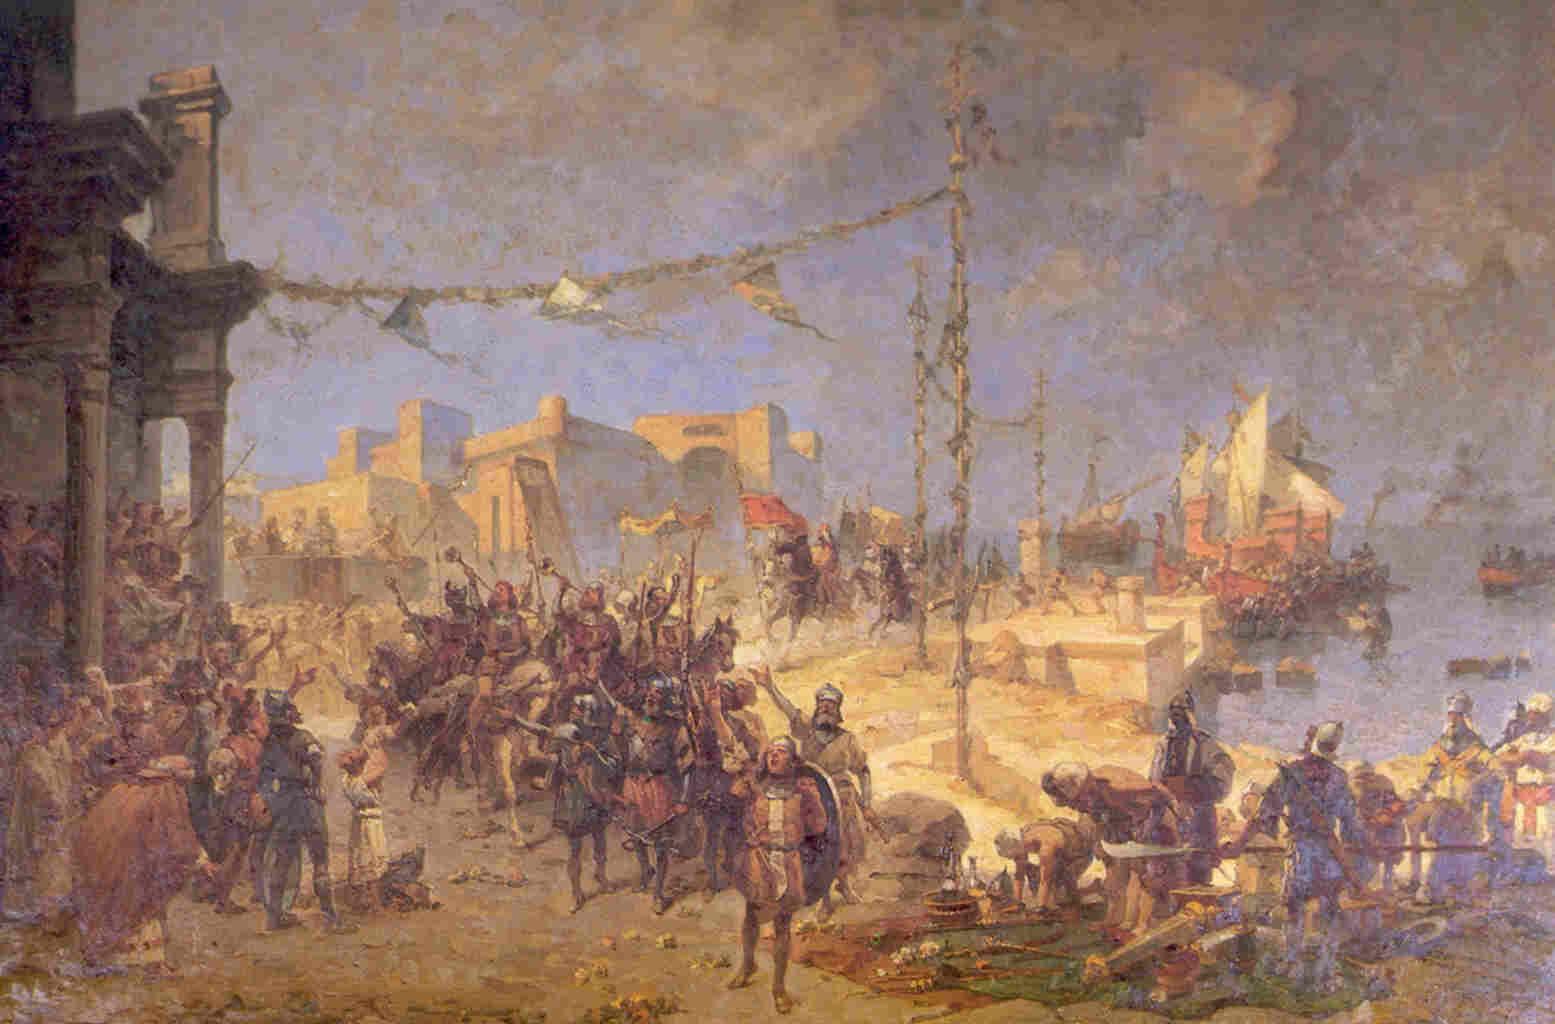 Venezia, Bari e i Saraceni – Vidua Vidue e la Sensa